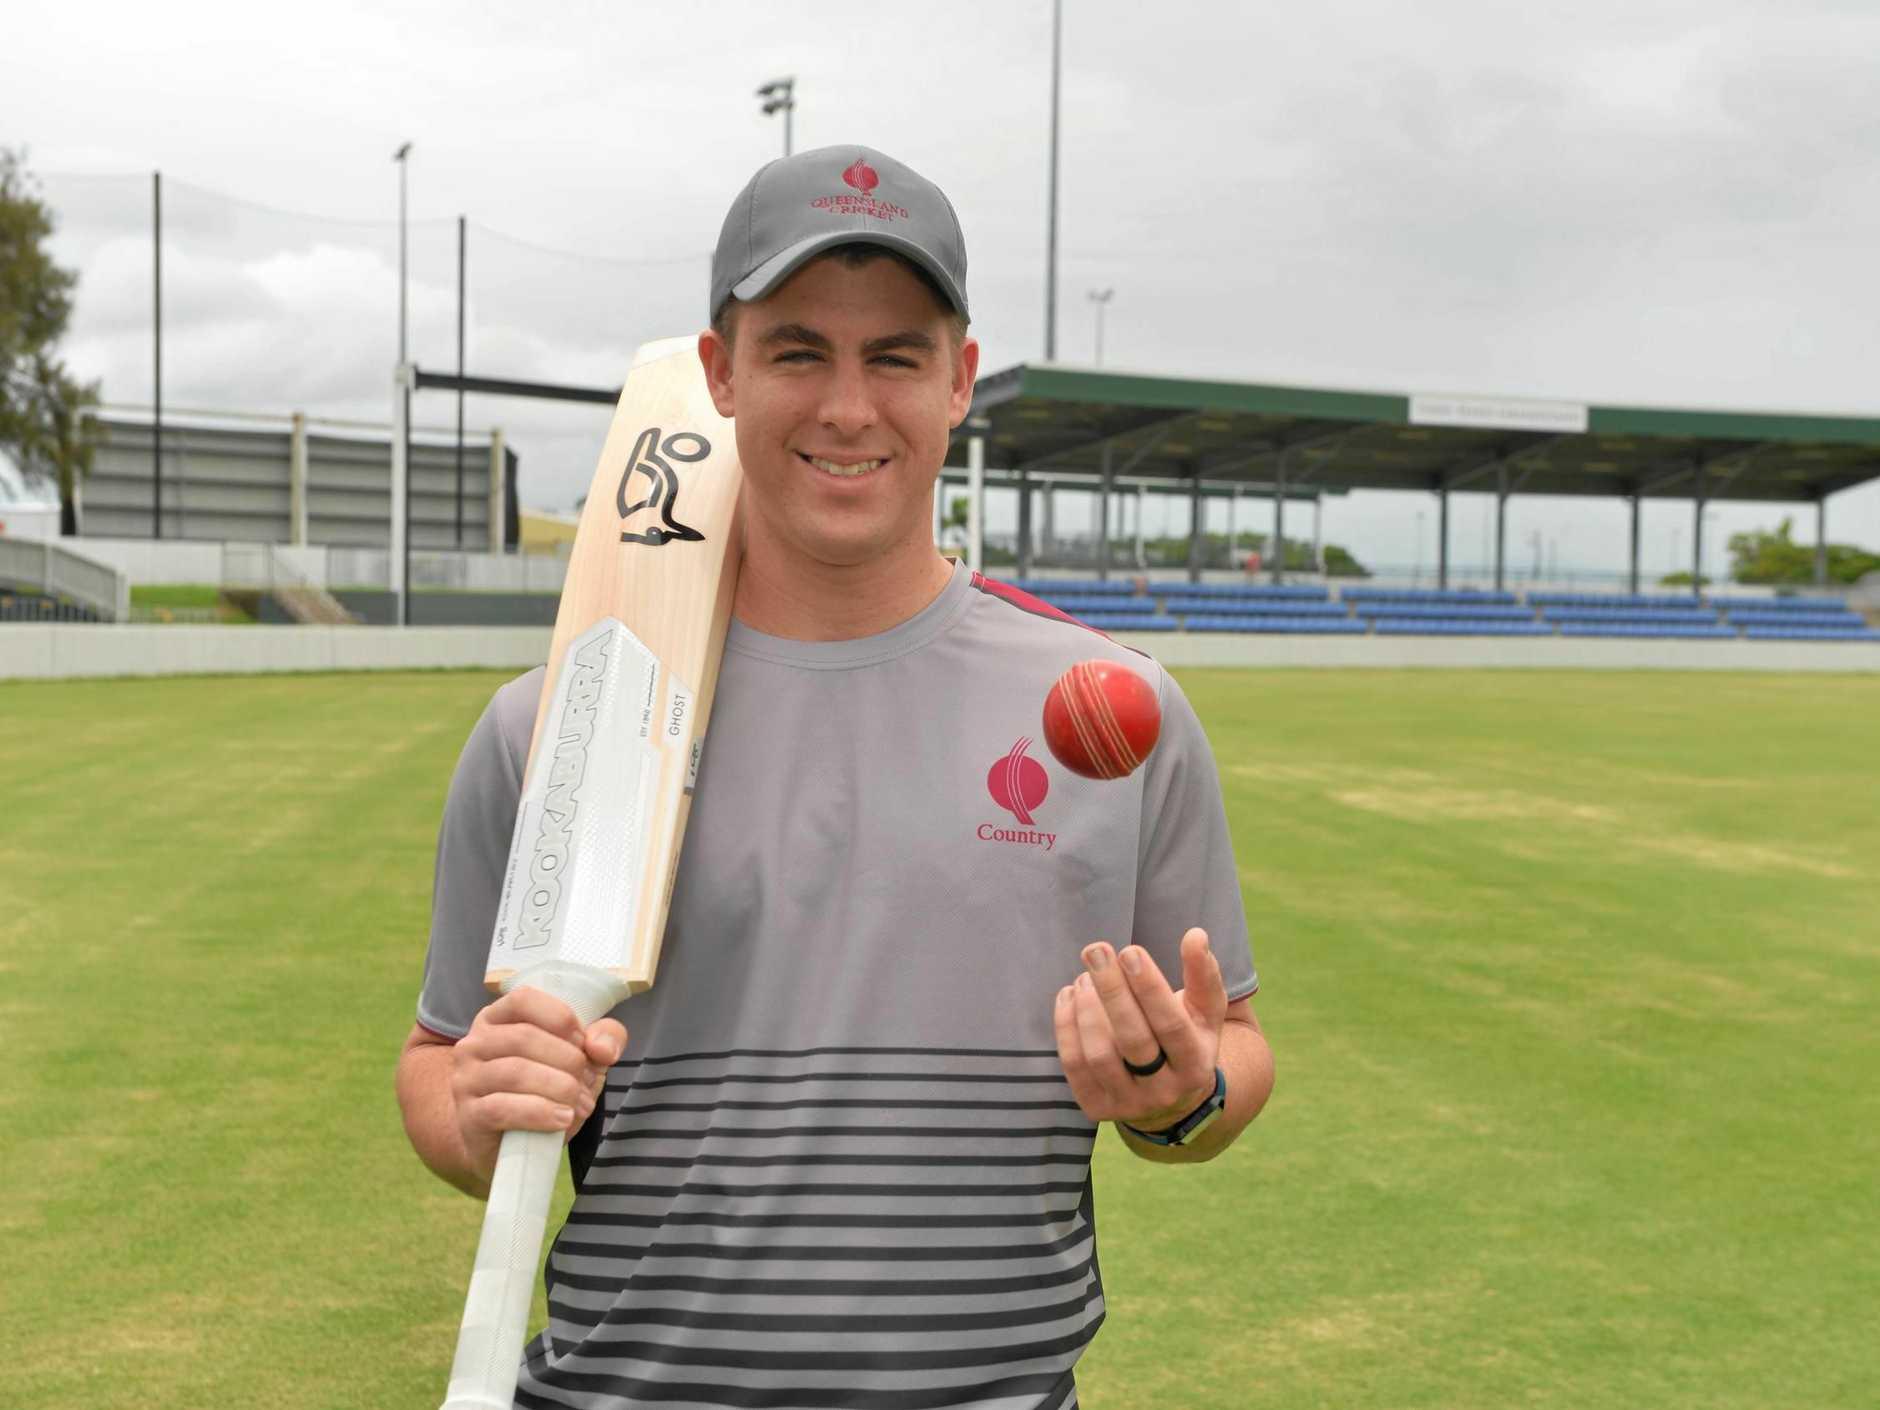 Mason Kohler flies off to Australian Country Championships at Shepparton on Monday 31/12/18.